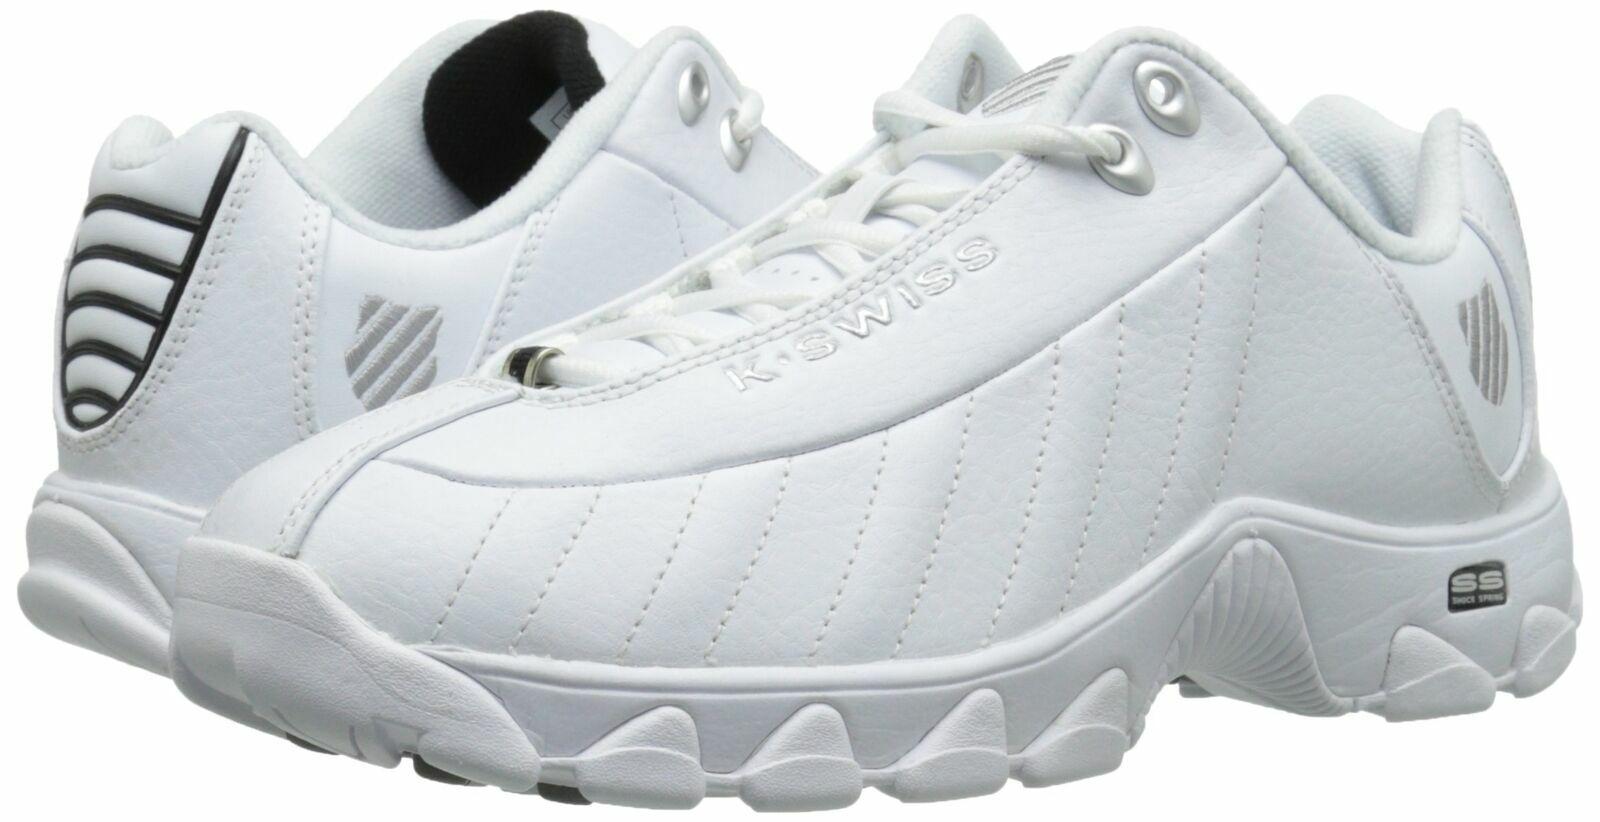 K-Swiss Men's ST329 Cmf Memory Foam Training Shoes  - 7.5 M